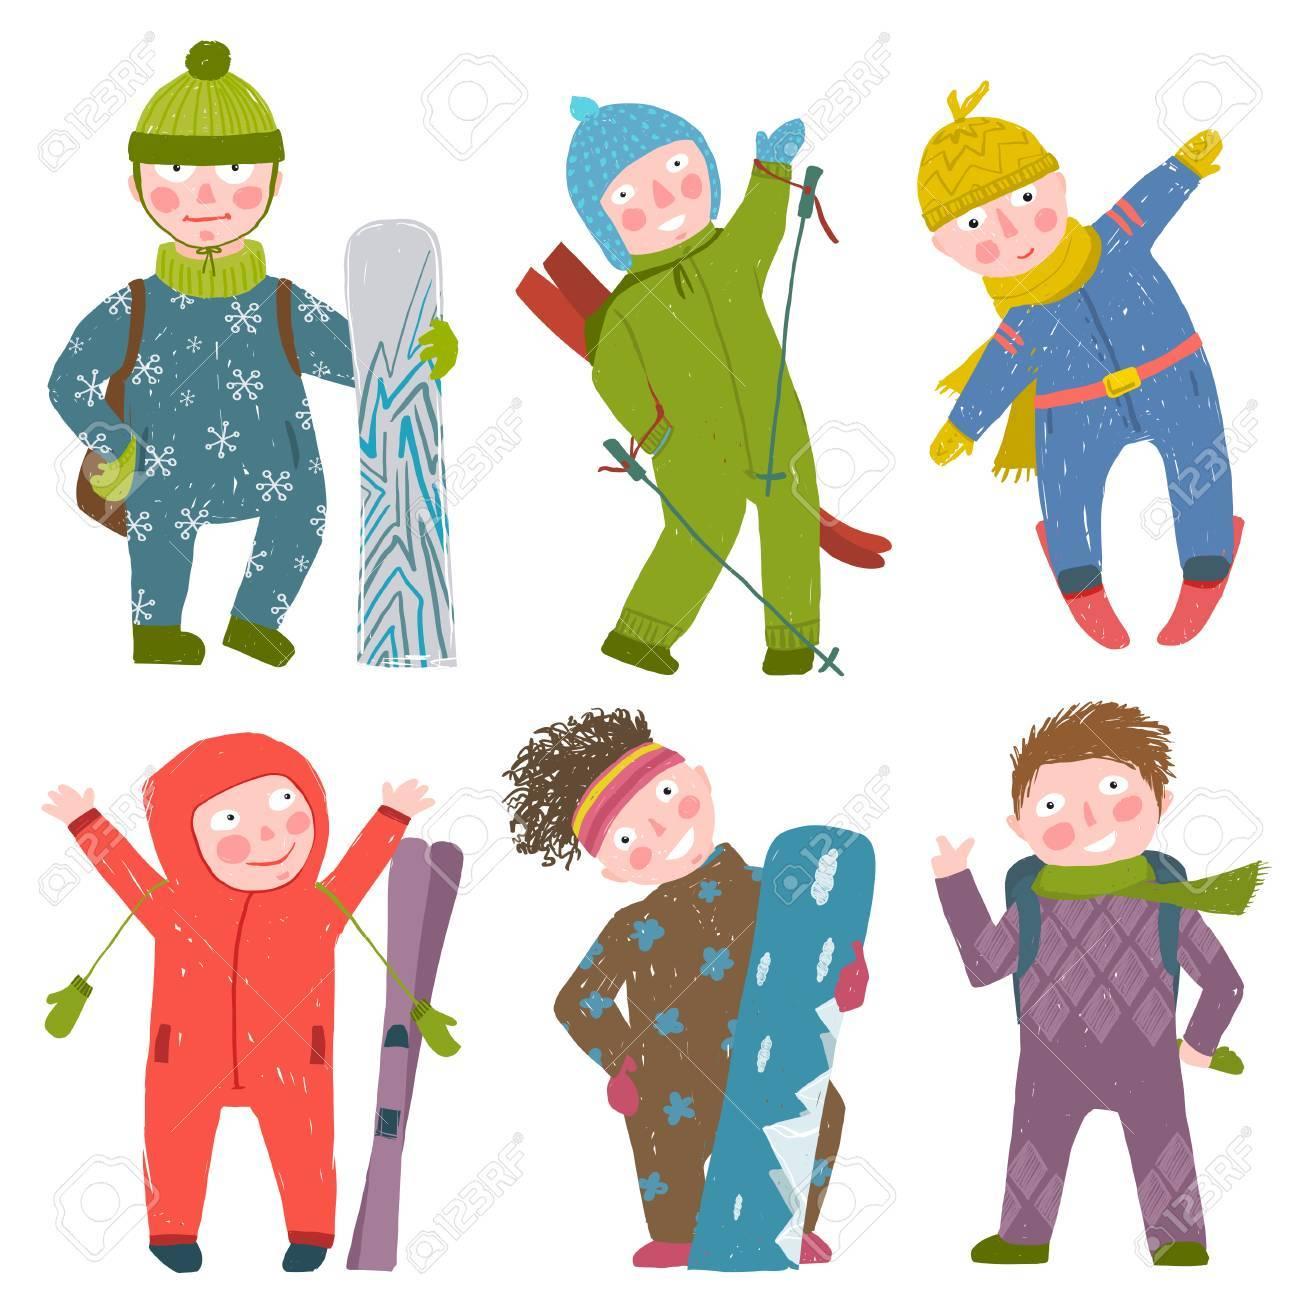 Snowboarding and skiing winter season fun sport vector illustration. - 46999102